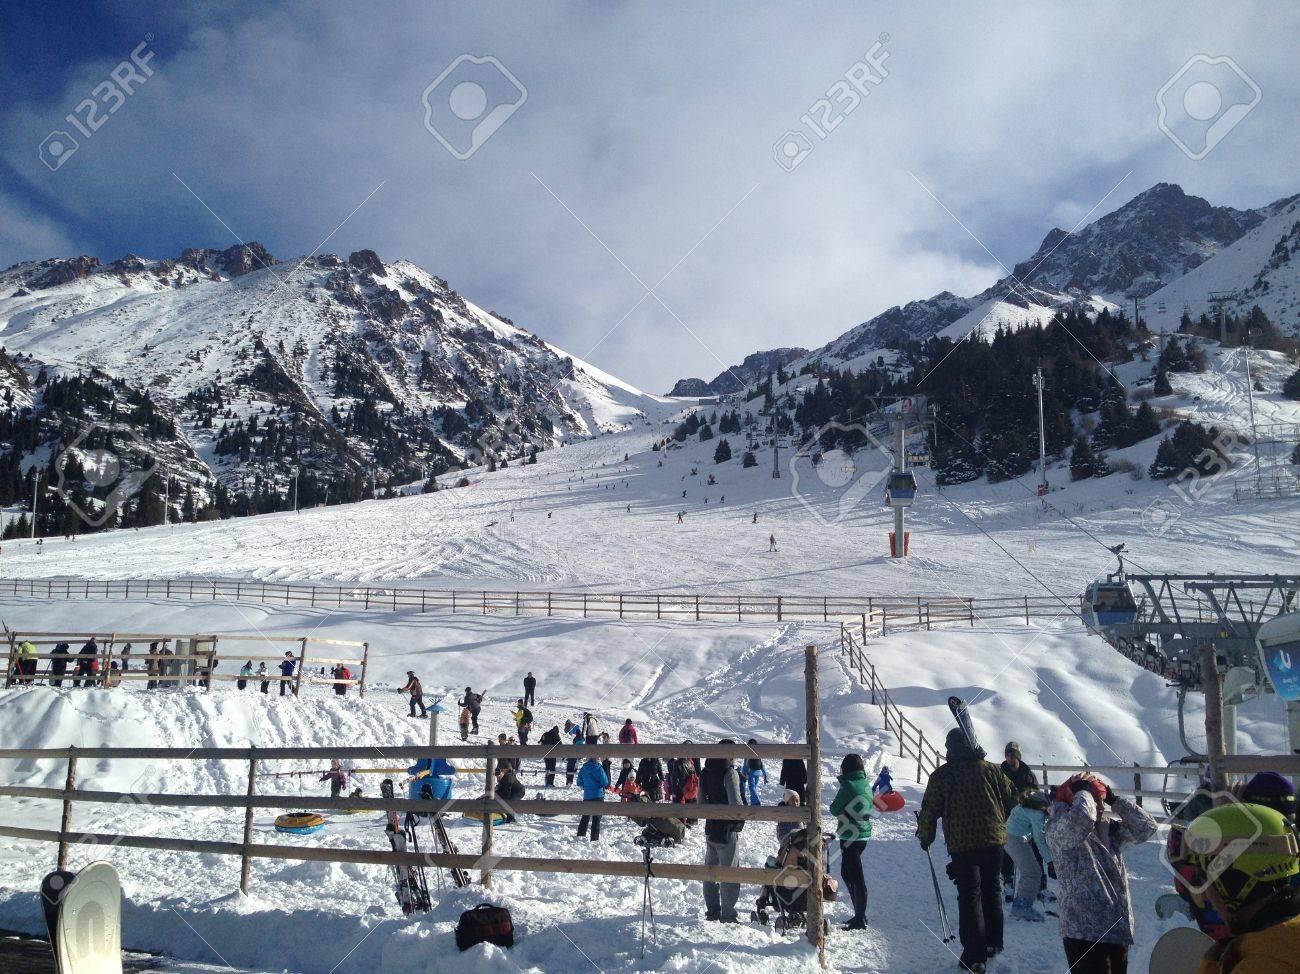 shymbulak ski resort in the almaty, kazakhstan stock photo, picture